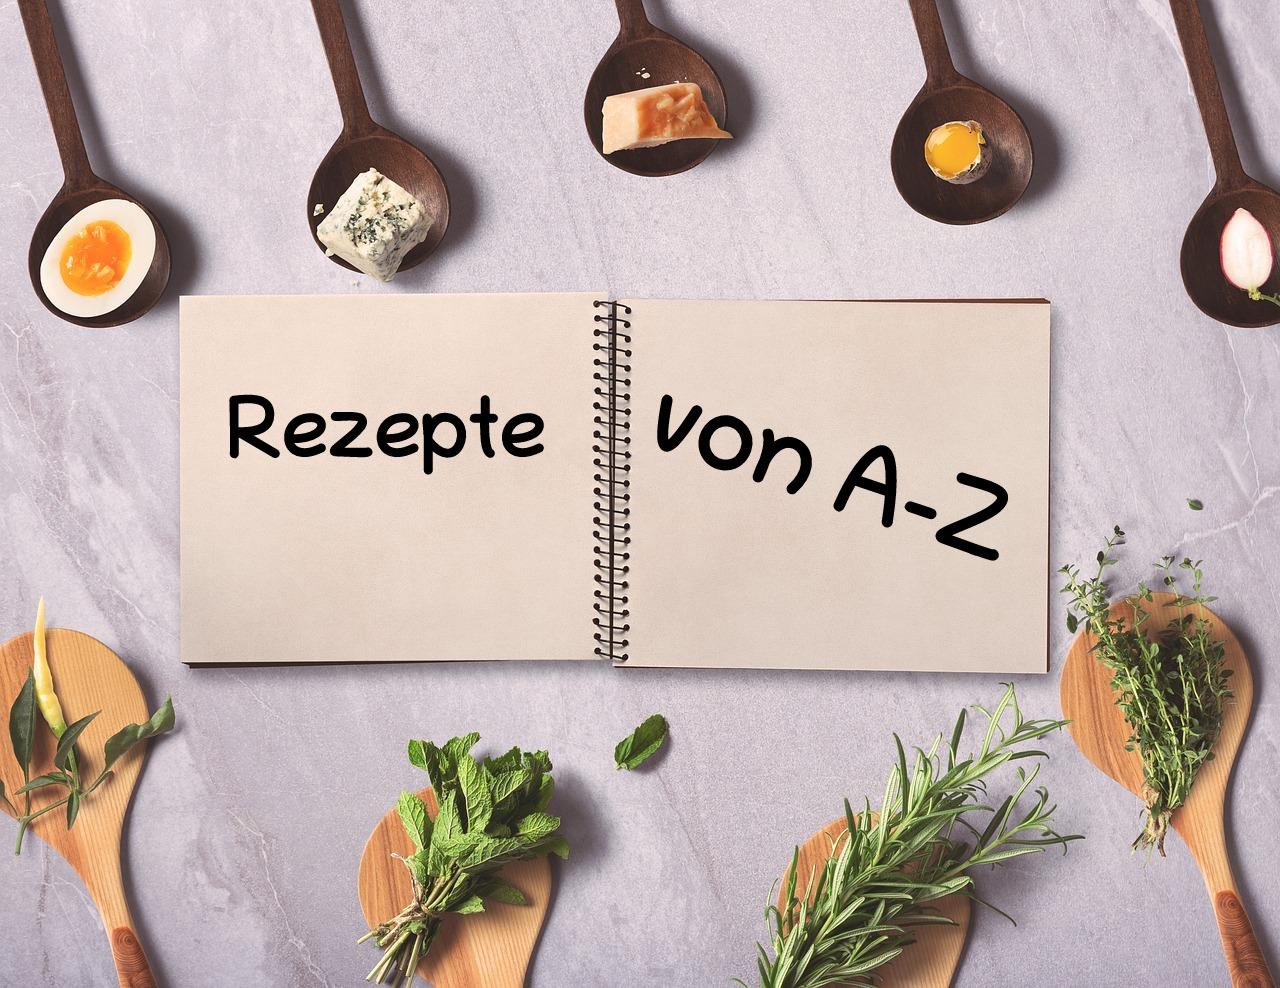 Rezepte von A-Z